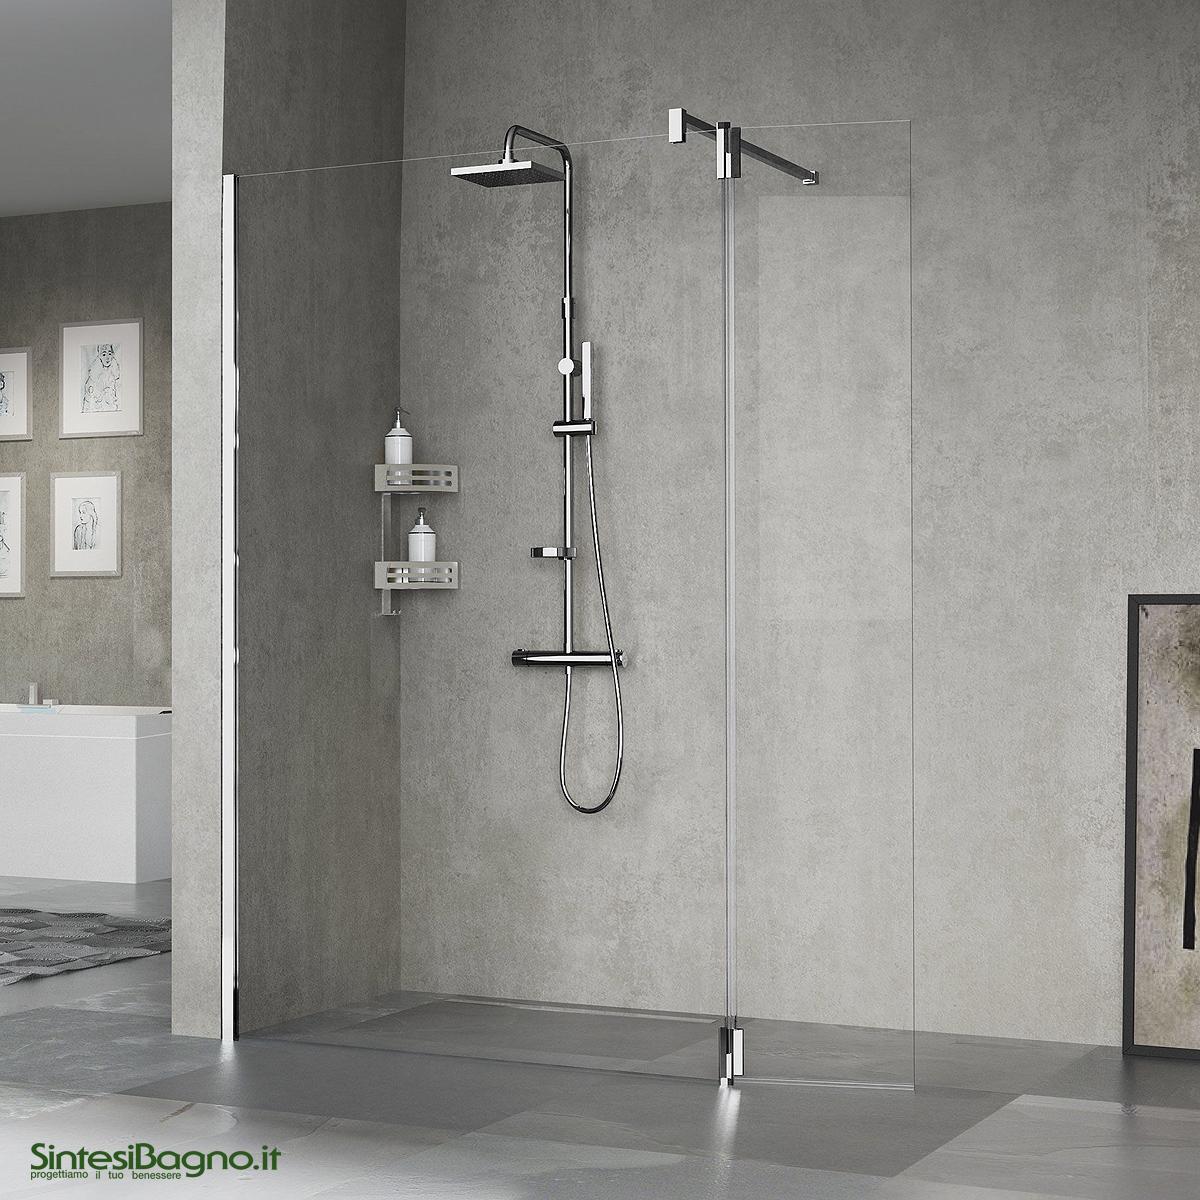 Colonna doccia attrezzata NOVELLINI EASY 2